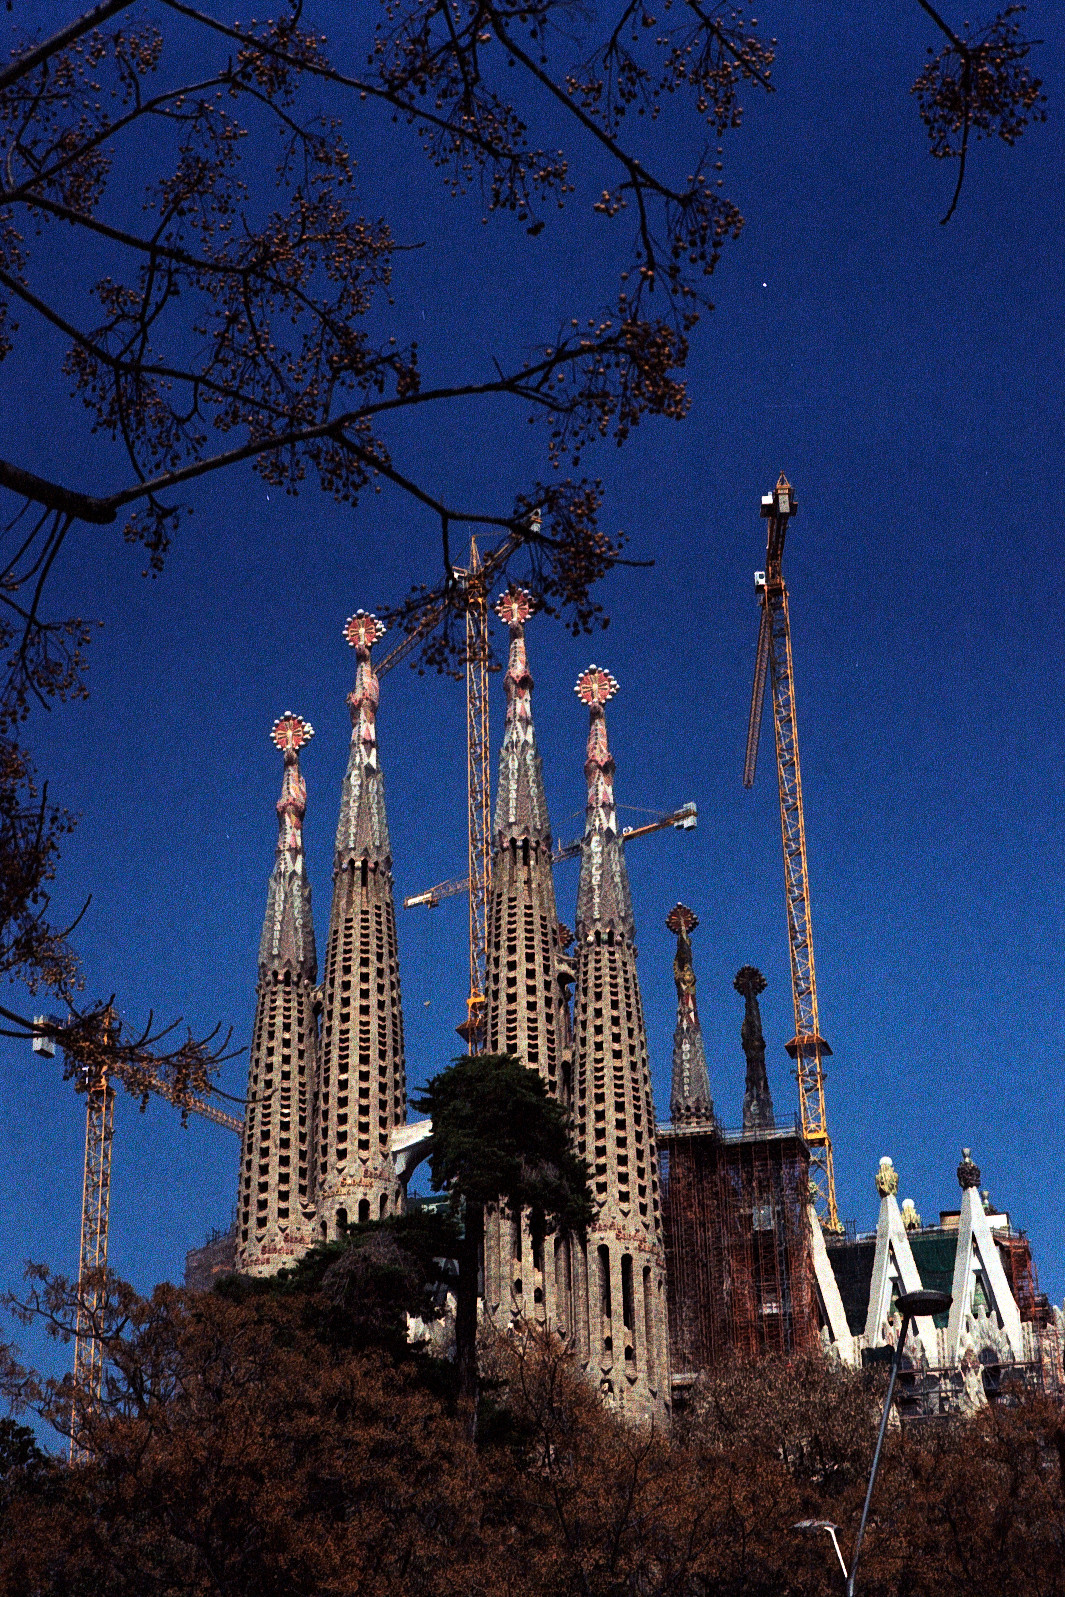 Barcelona, random shots in color